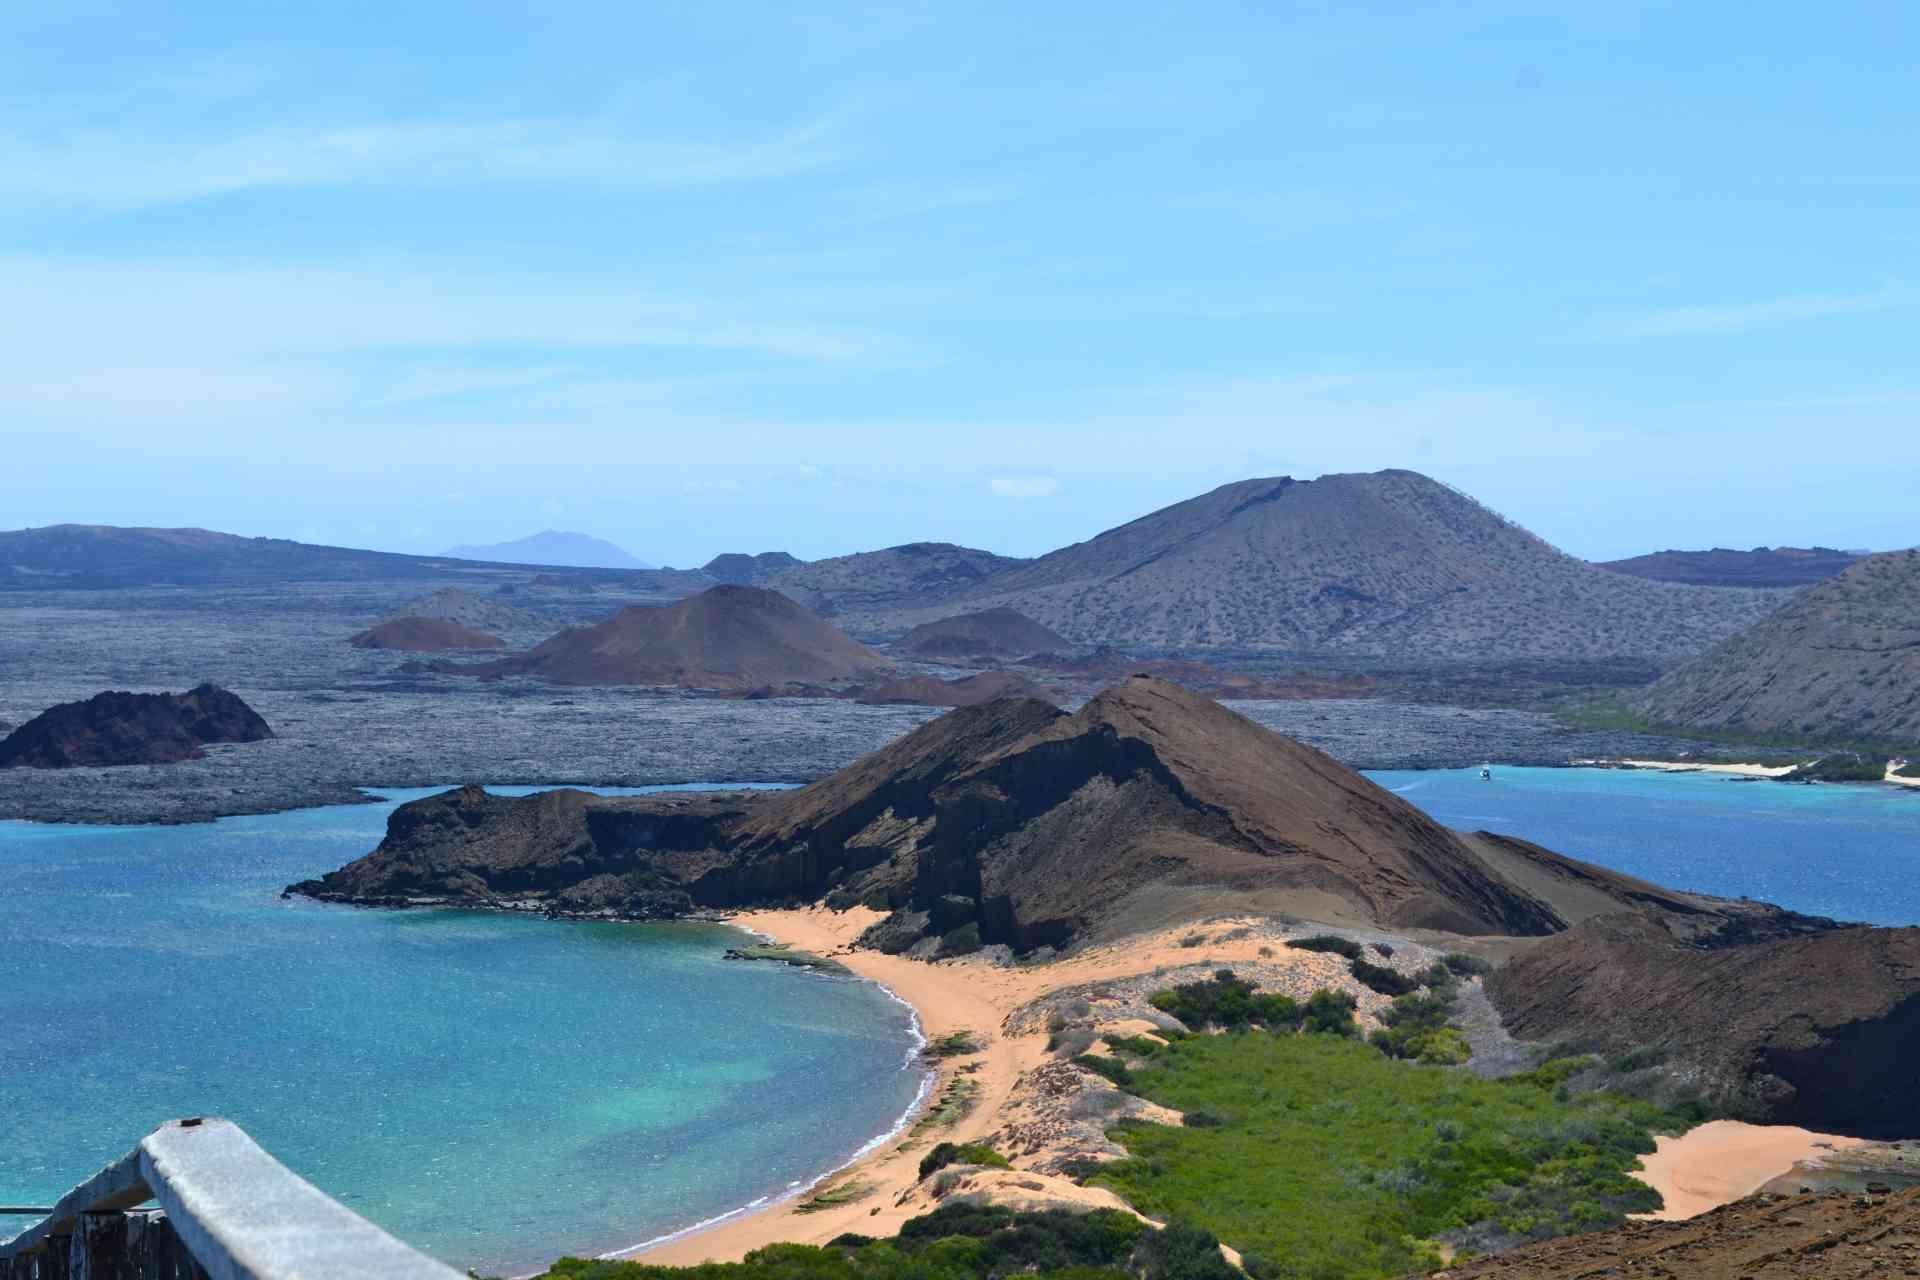 Views of the Galapagos Islands, Ecuador by Natalia Borojovich